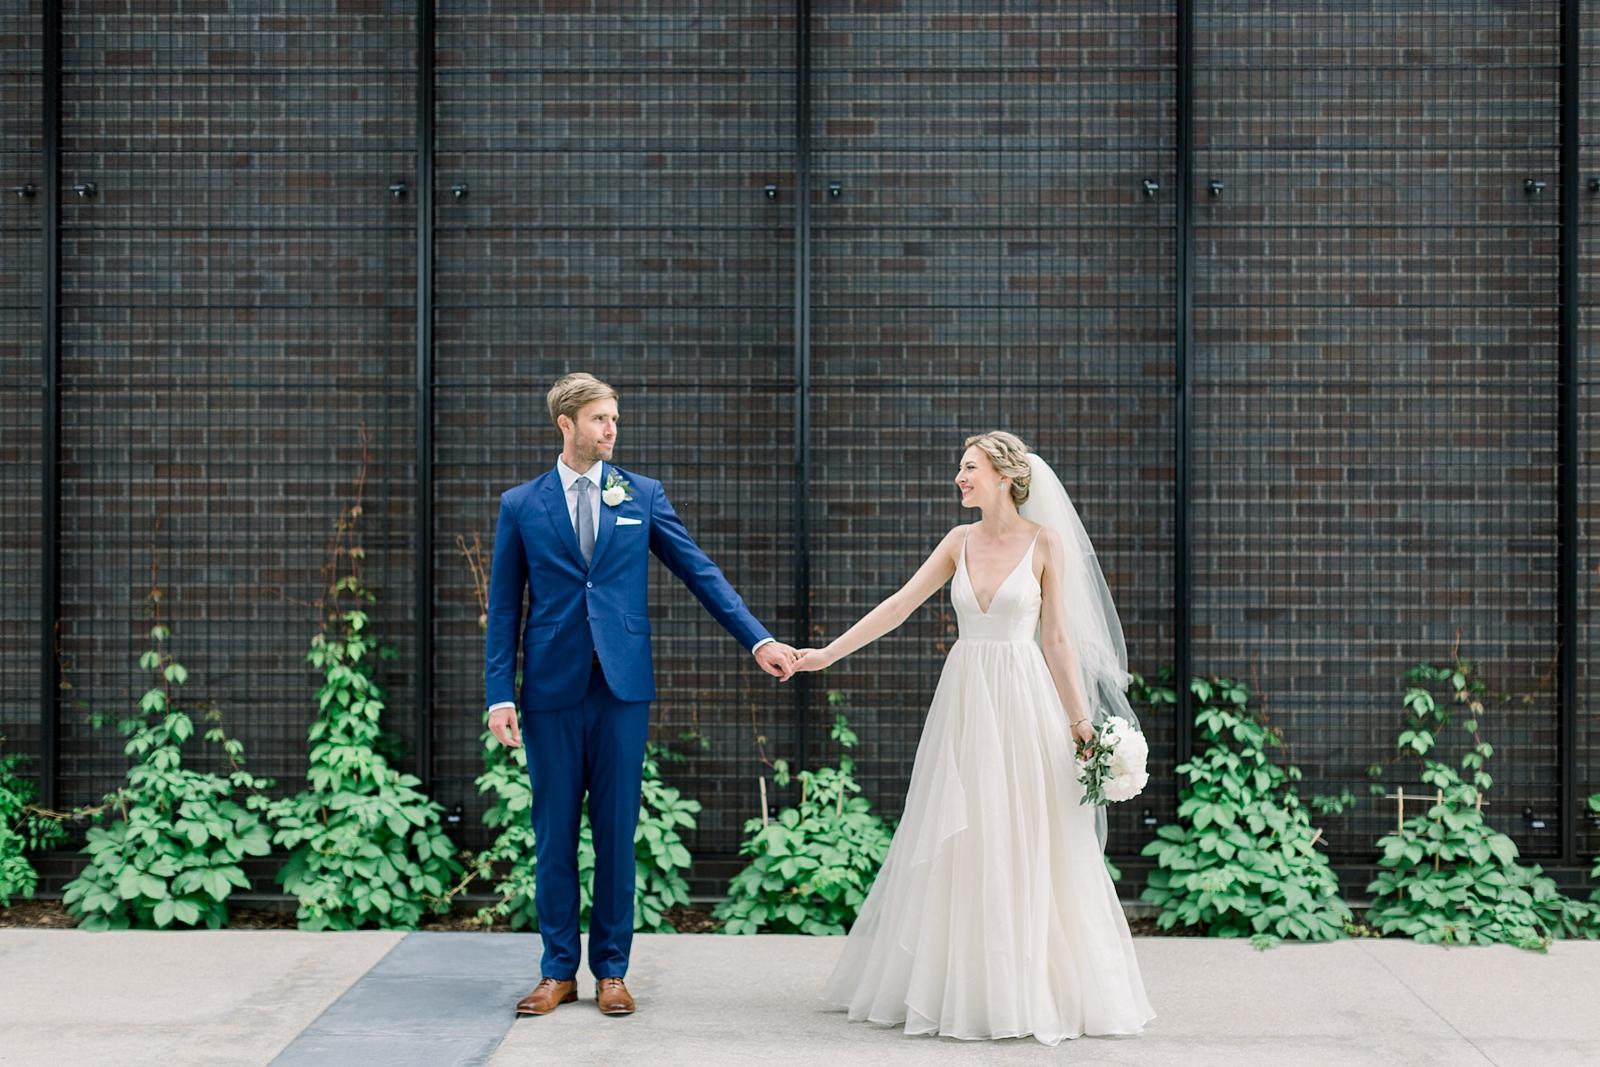 Hinterland-Brewery-Modern-Wedding-Shaunae-Teske-Photography-150.jpg